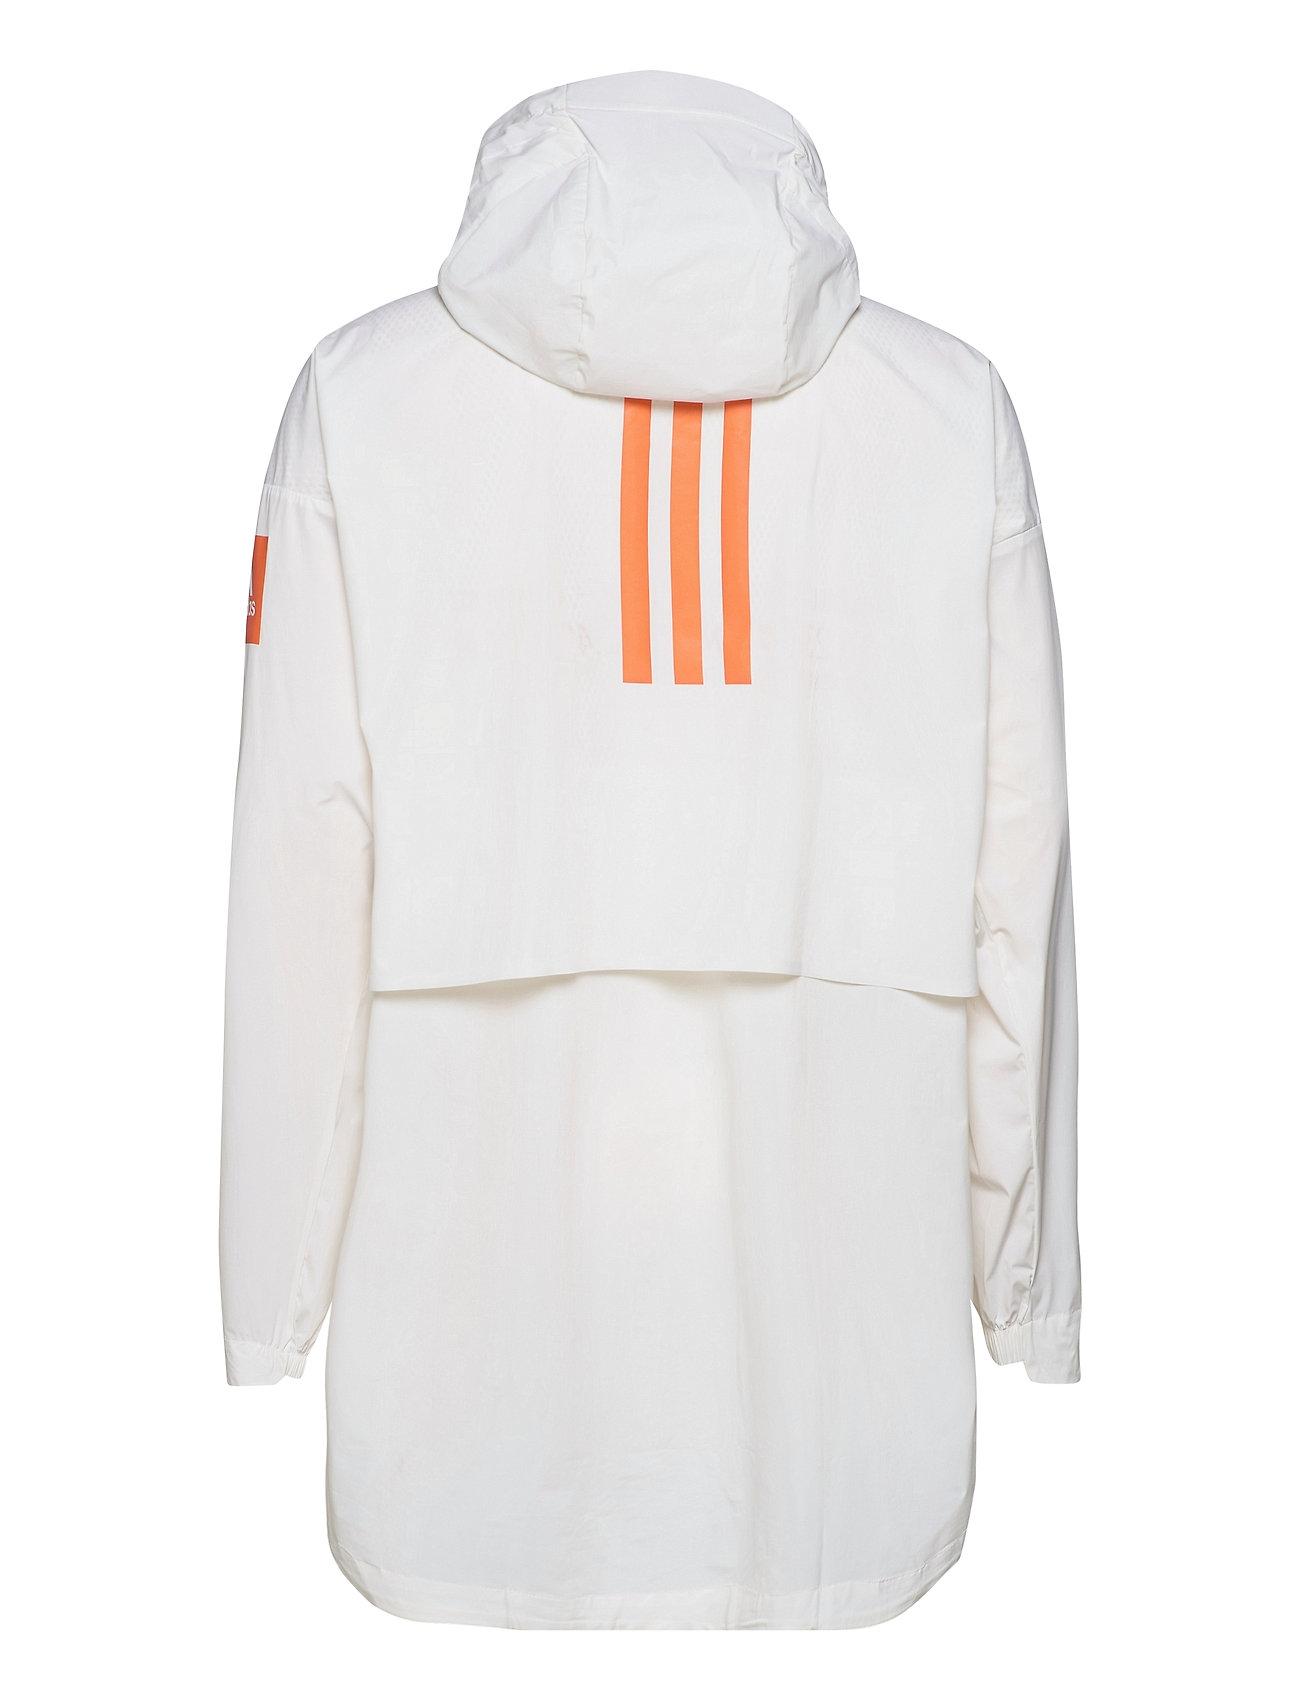 ADIDAS Sportoberteile | Myshelter W.R. Outerwear Sport Jackets Weiß ADIDAS PERFORMANCE